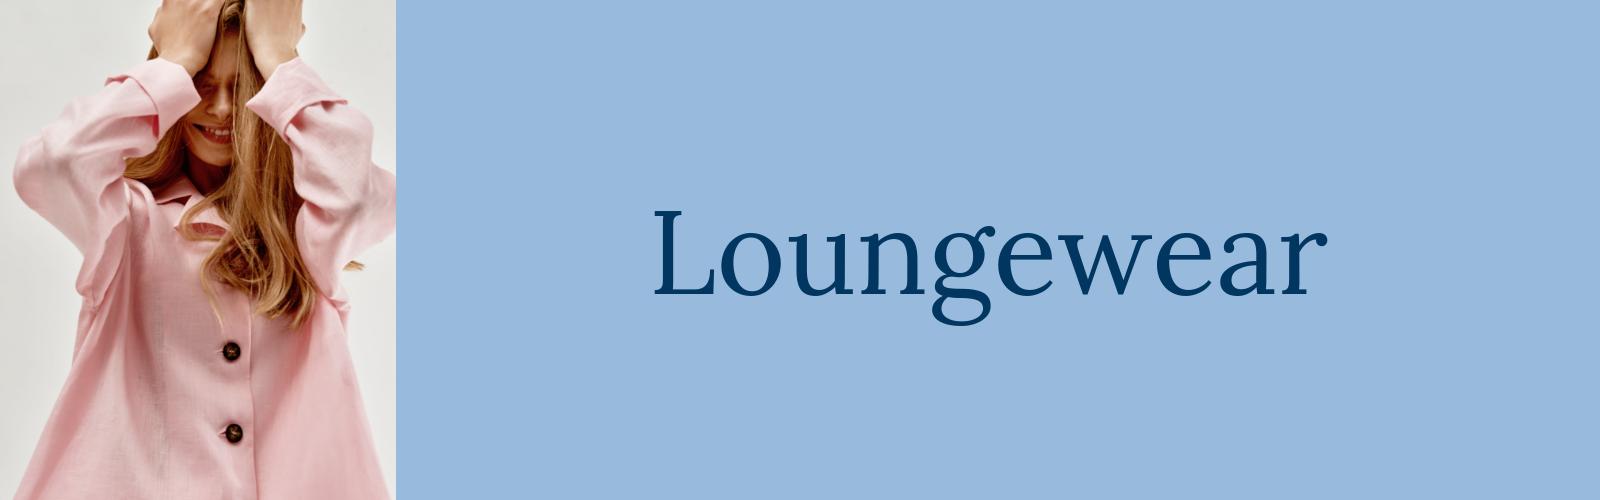 Loungewear til dame